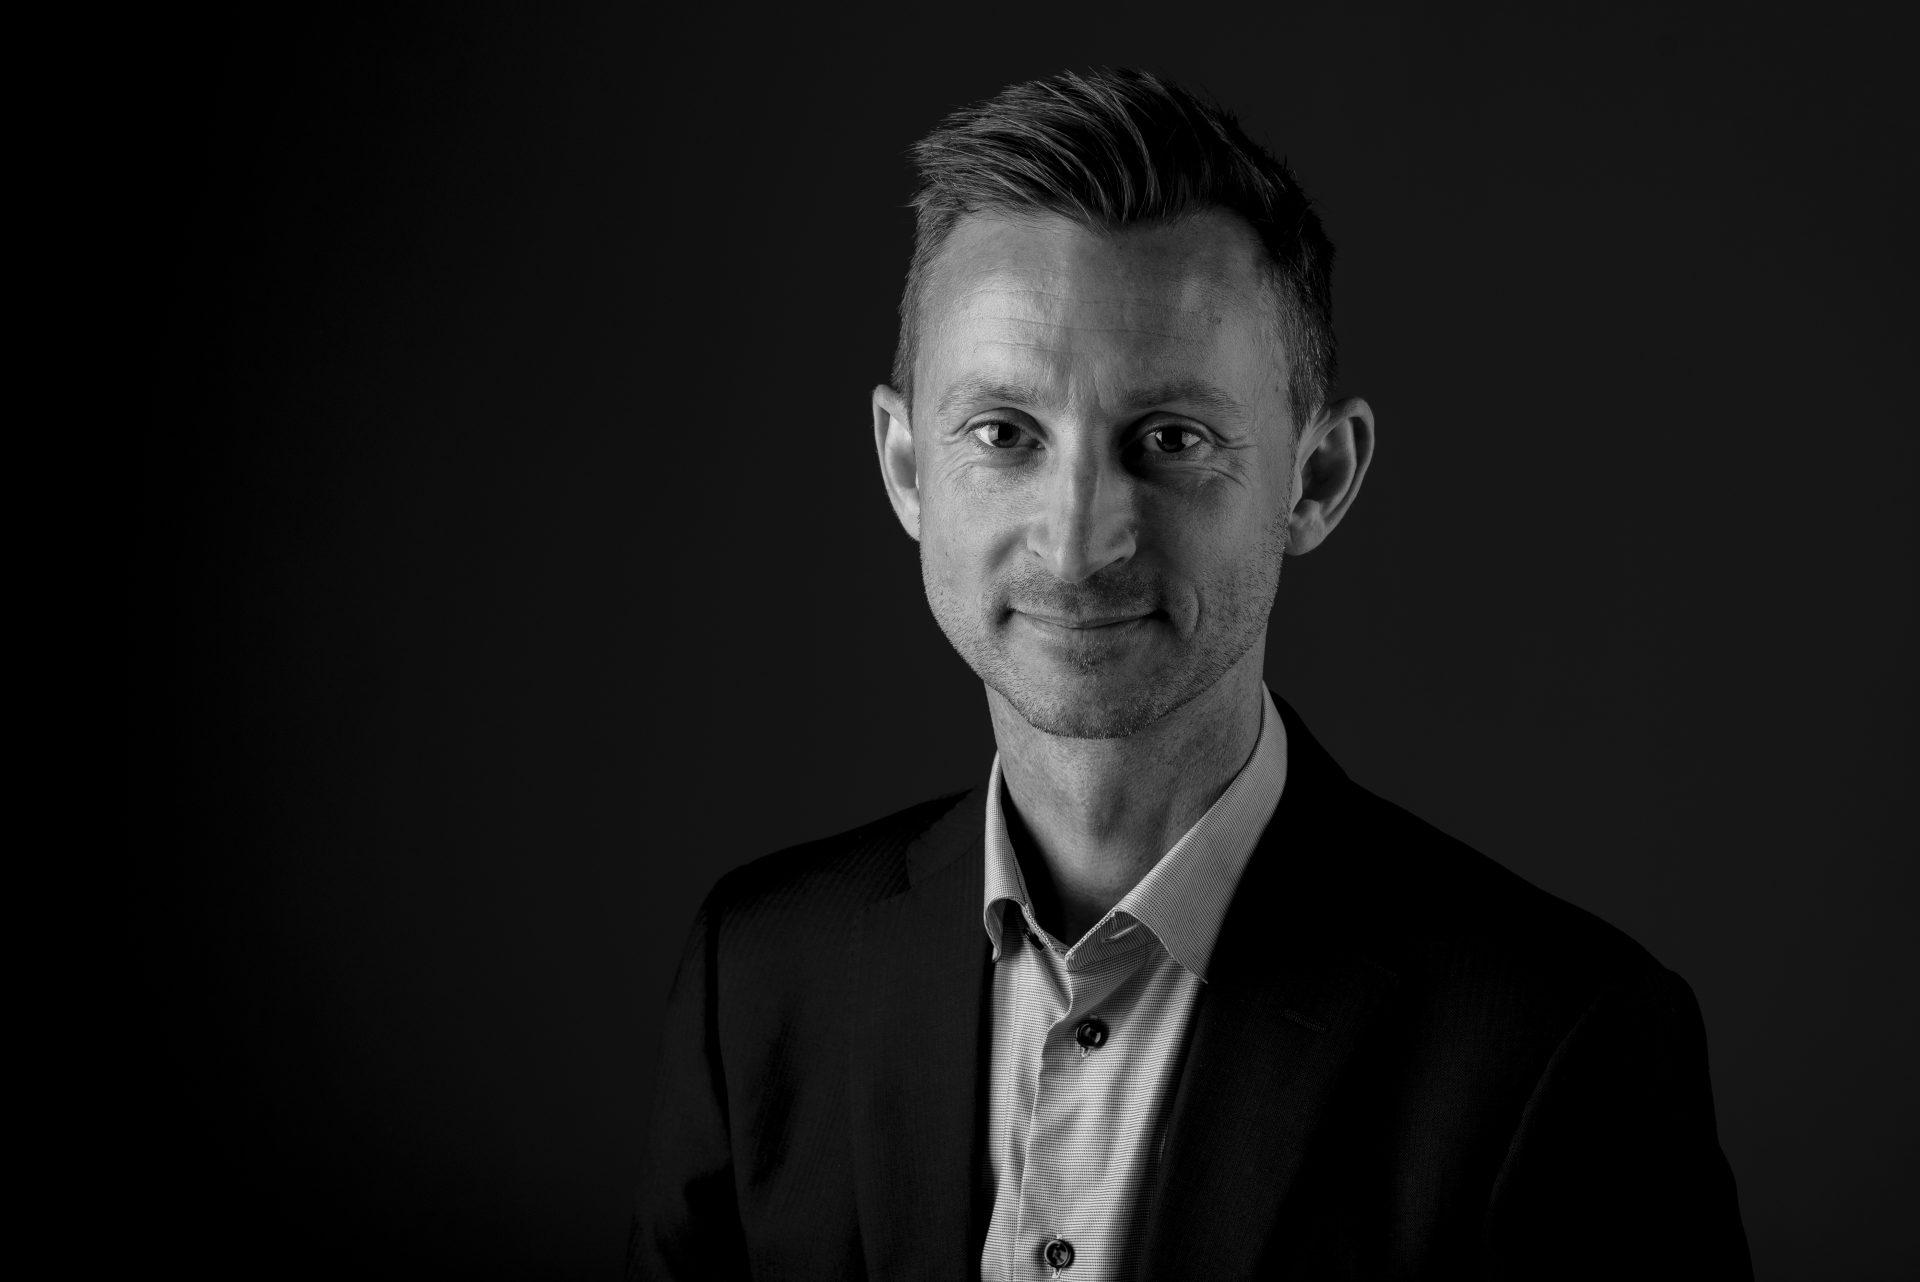 Direktør i Woco, Mikkel Aarø-Hansen